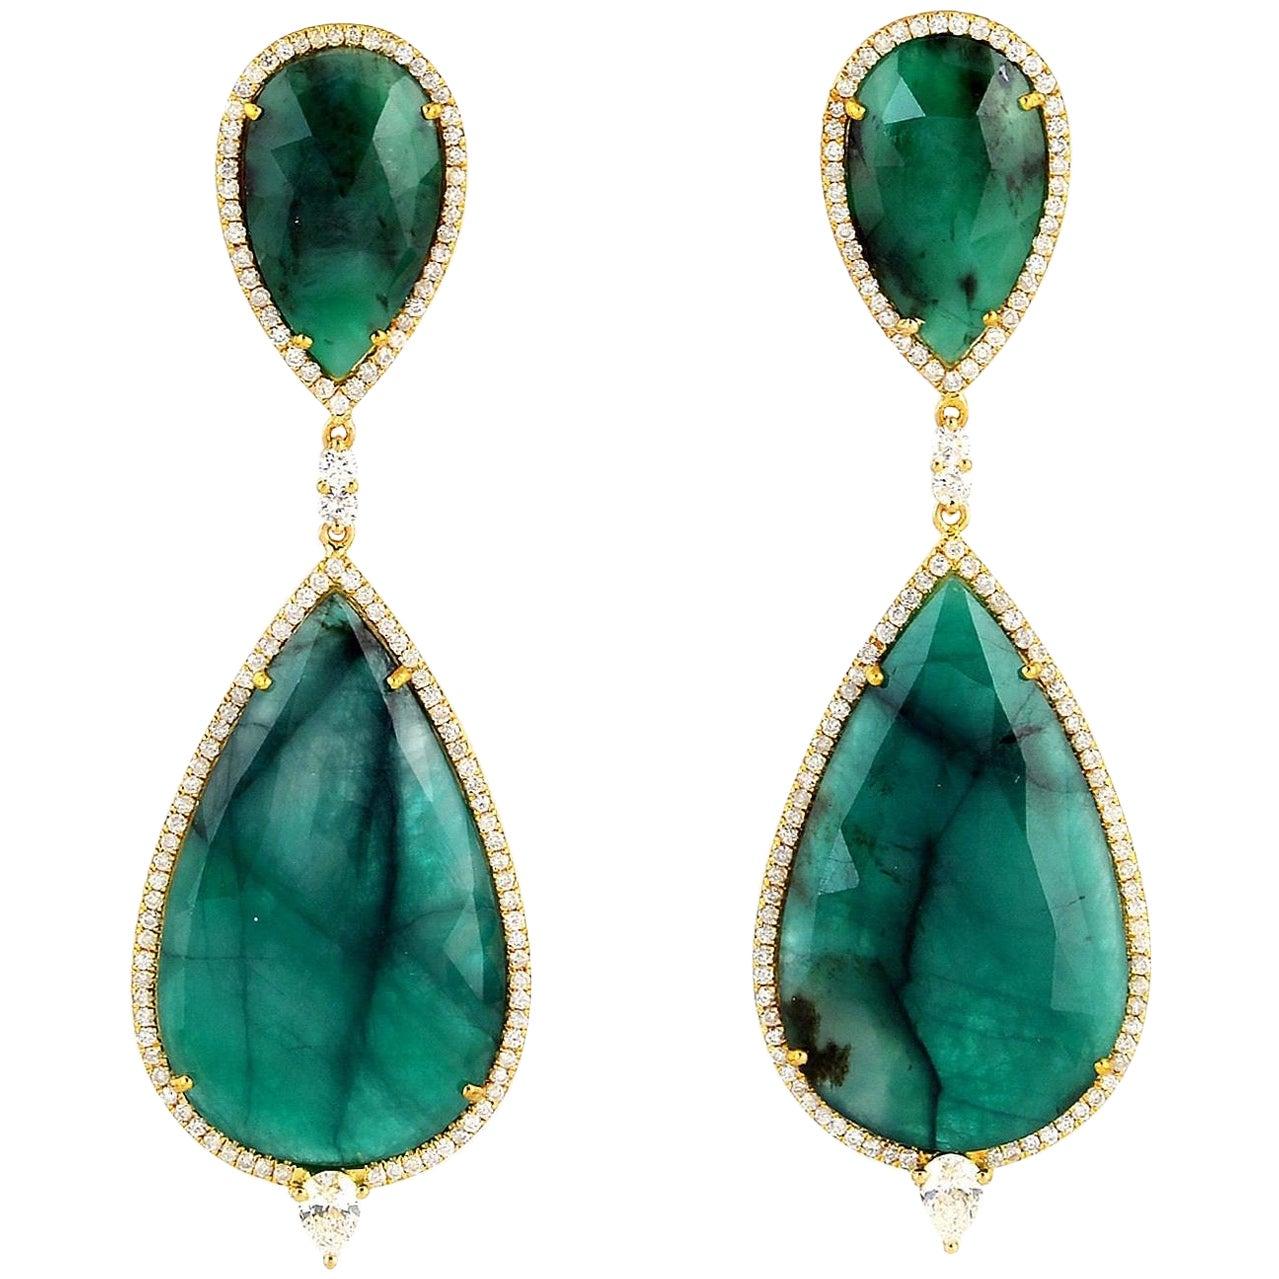 34.95 Carat Emerald Diamond 18 Karat Gold Earrings